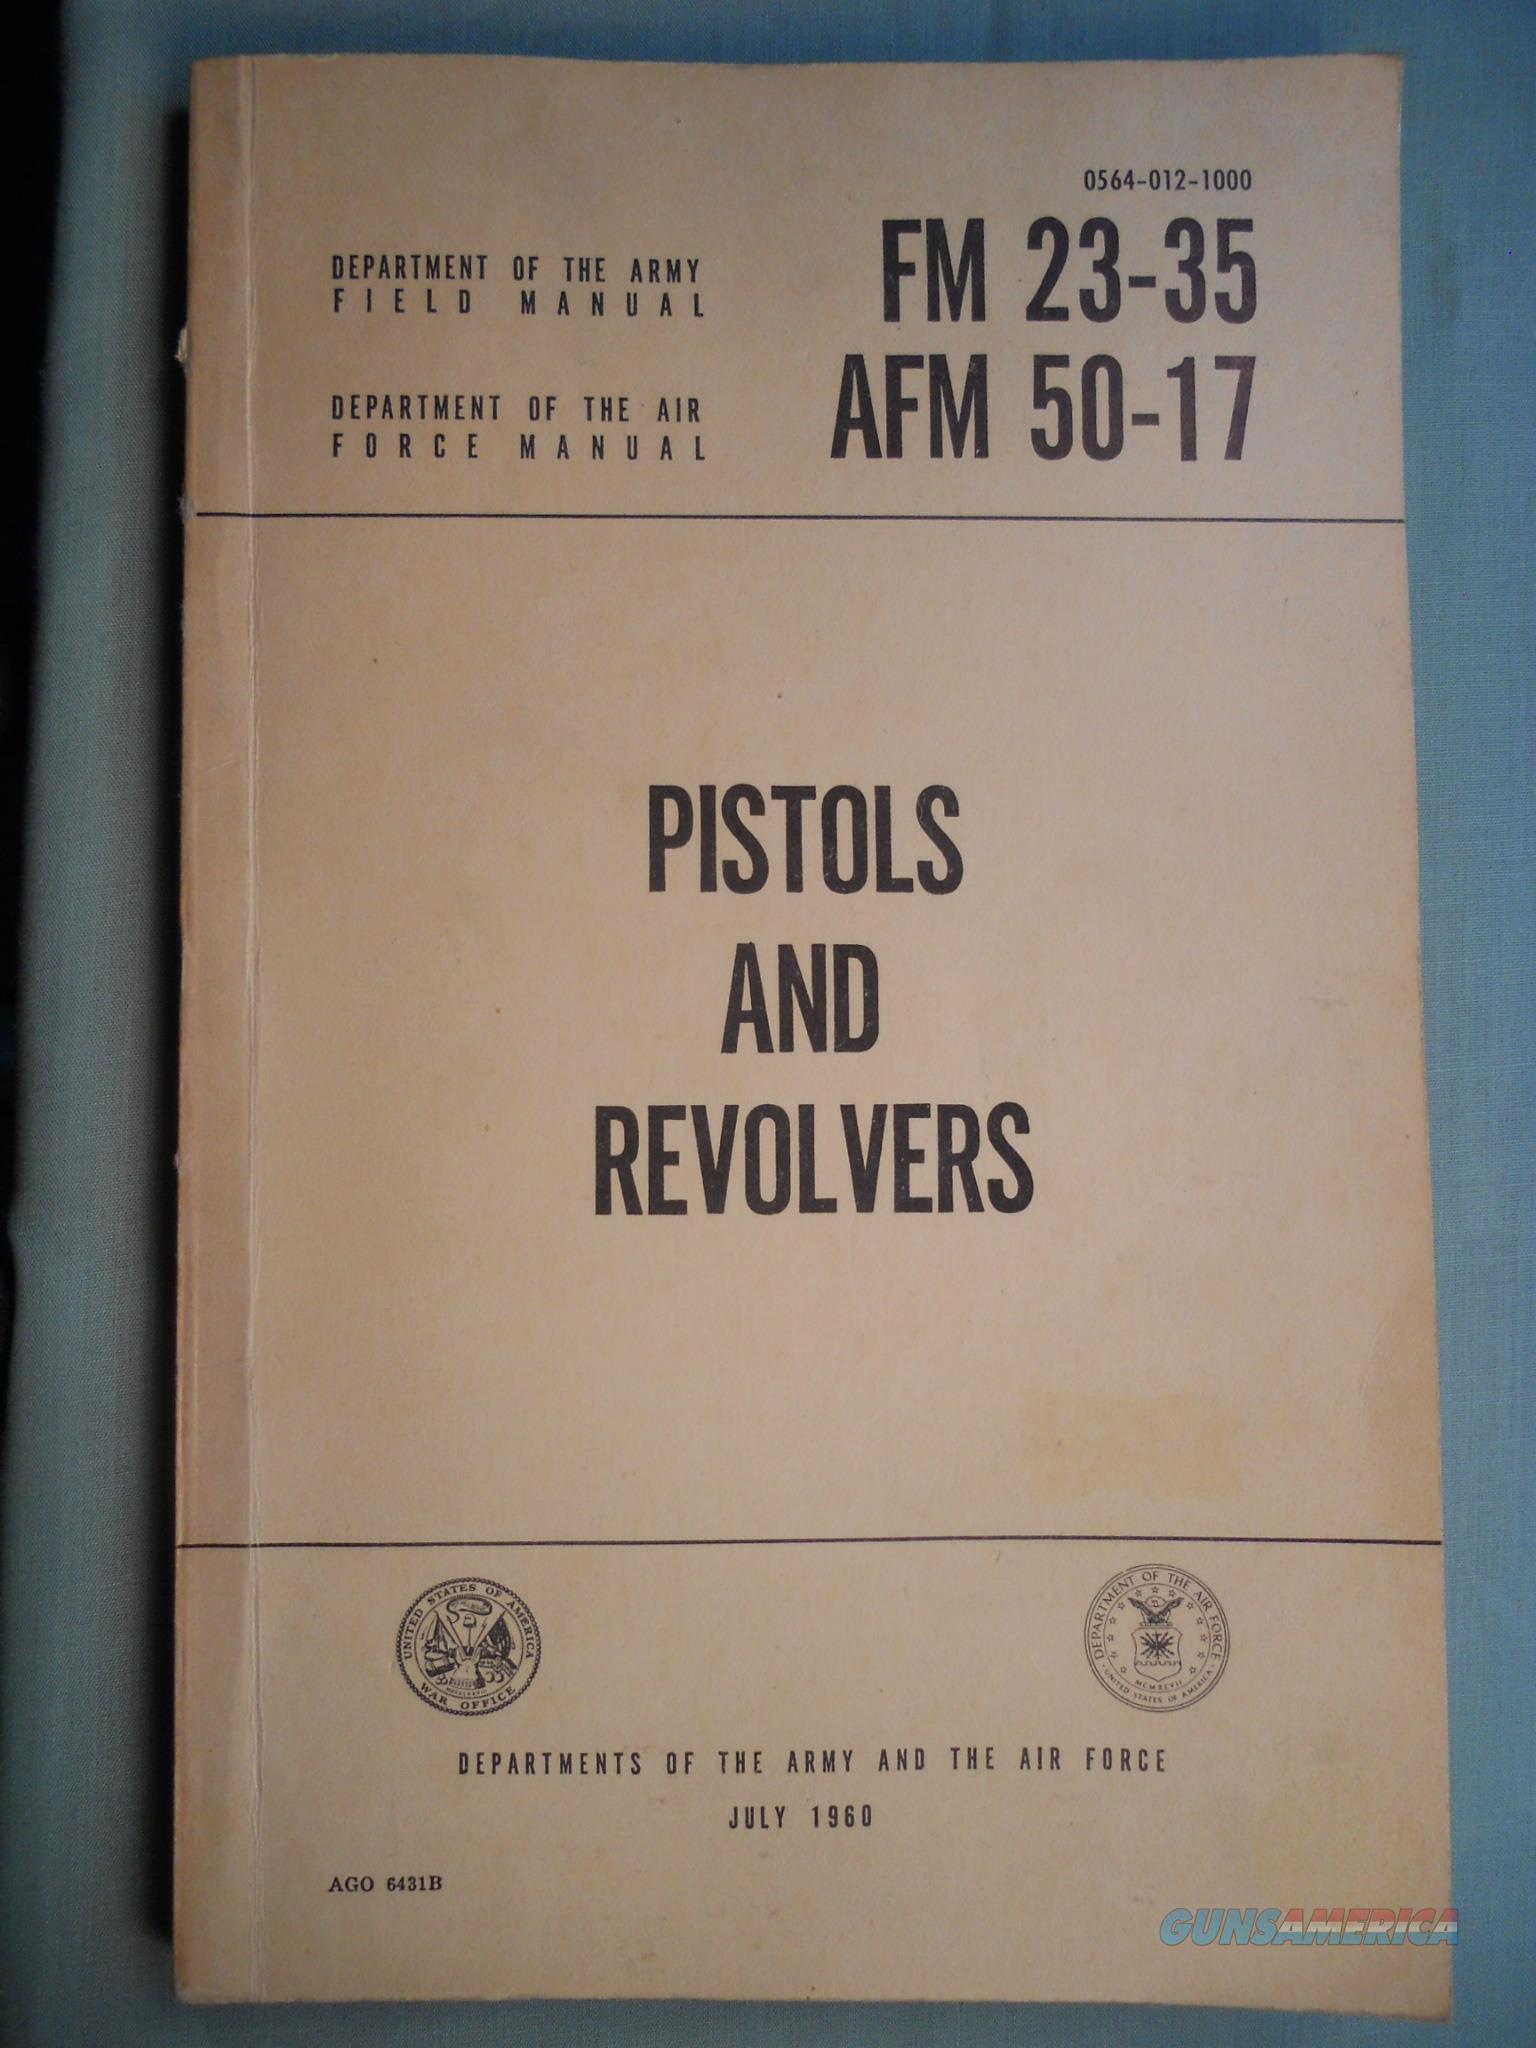 Field Manual Pistols & Revolvers FM 23-35 & AFM 50-17 book JULY 1960  Non-Guns > Magazines & Clips > Pistol Magazines > 1911